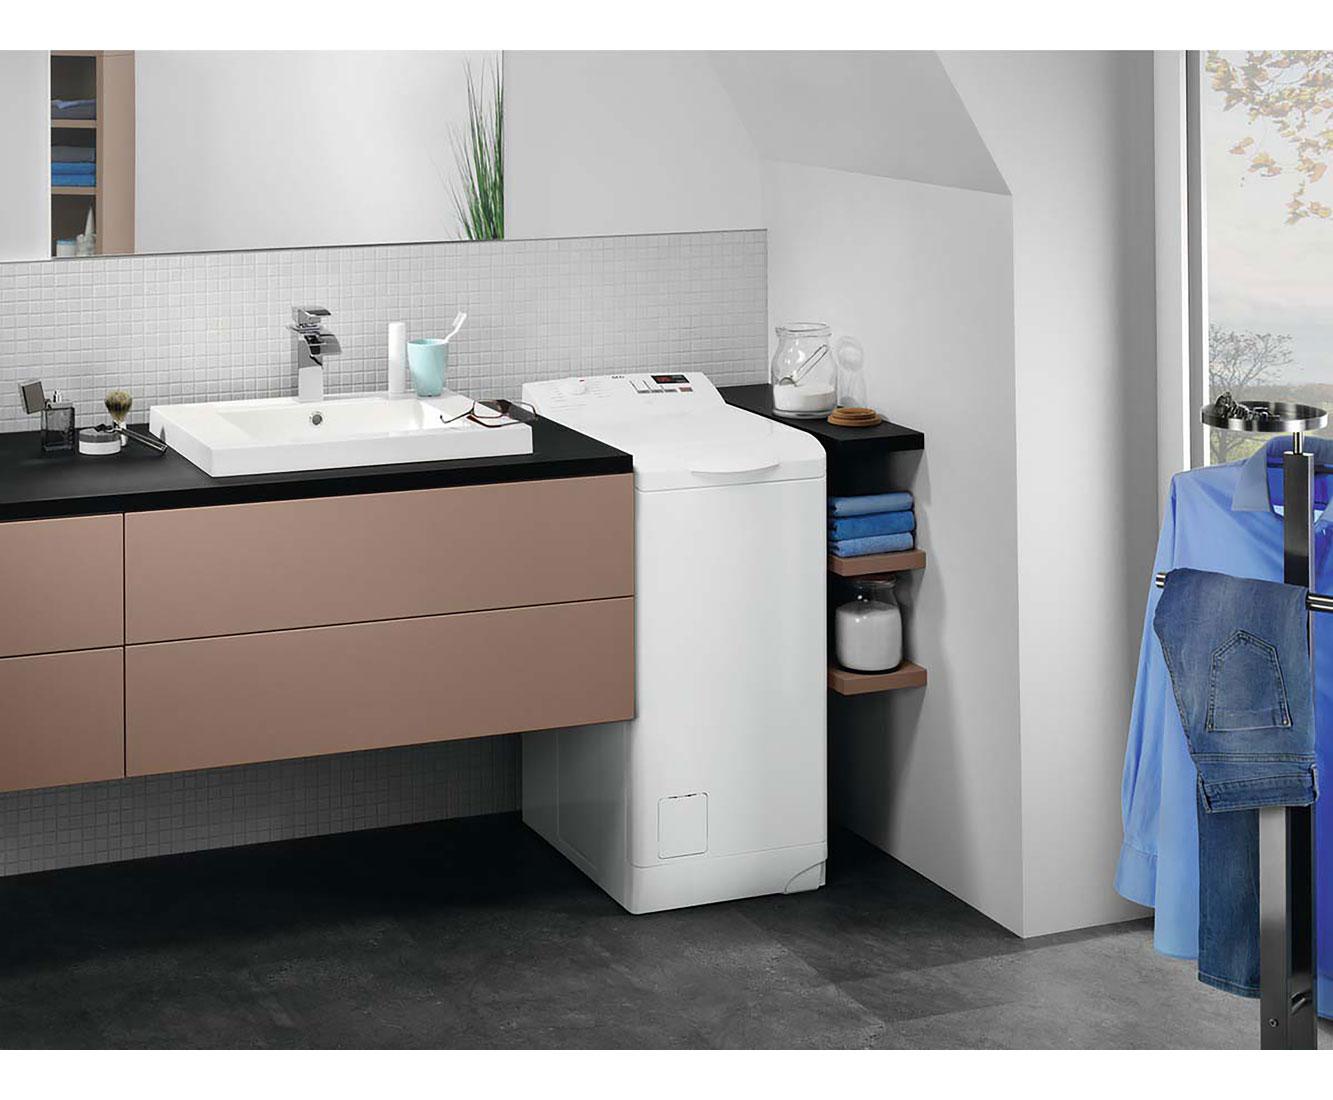 Aeg lavamat l6tb40460 waschmaschine toplader 6 kg 1400 u min a